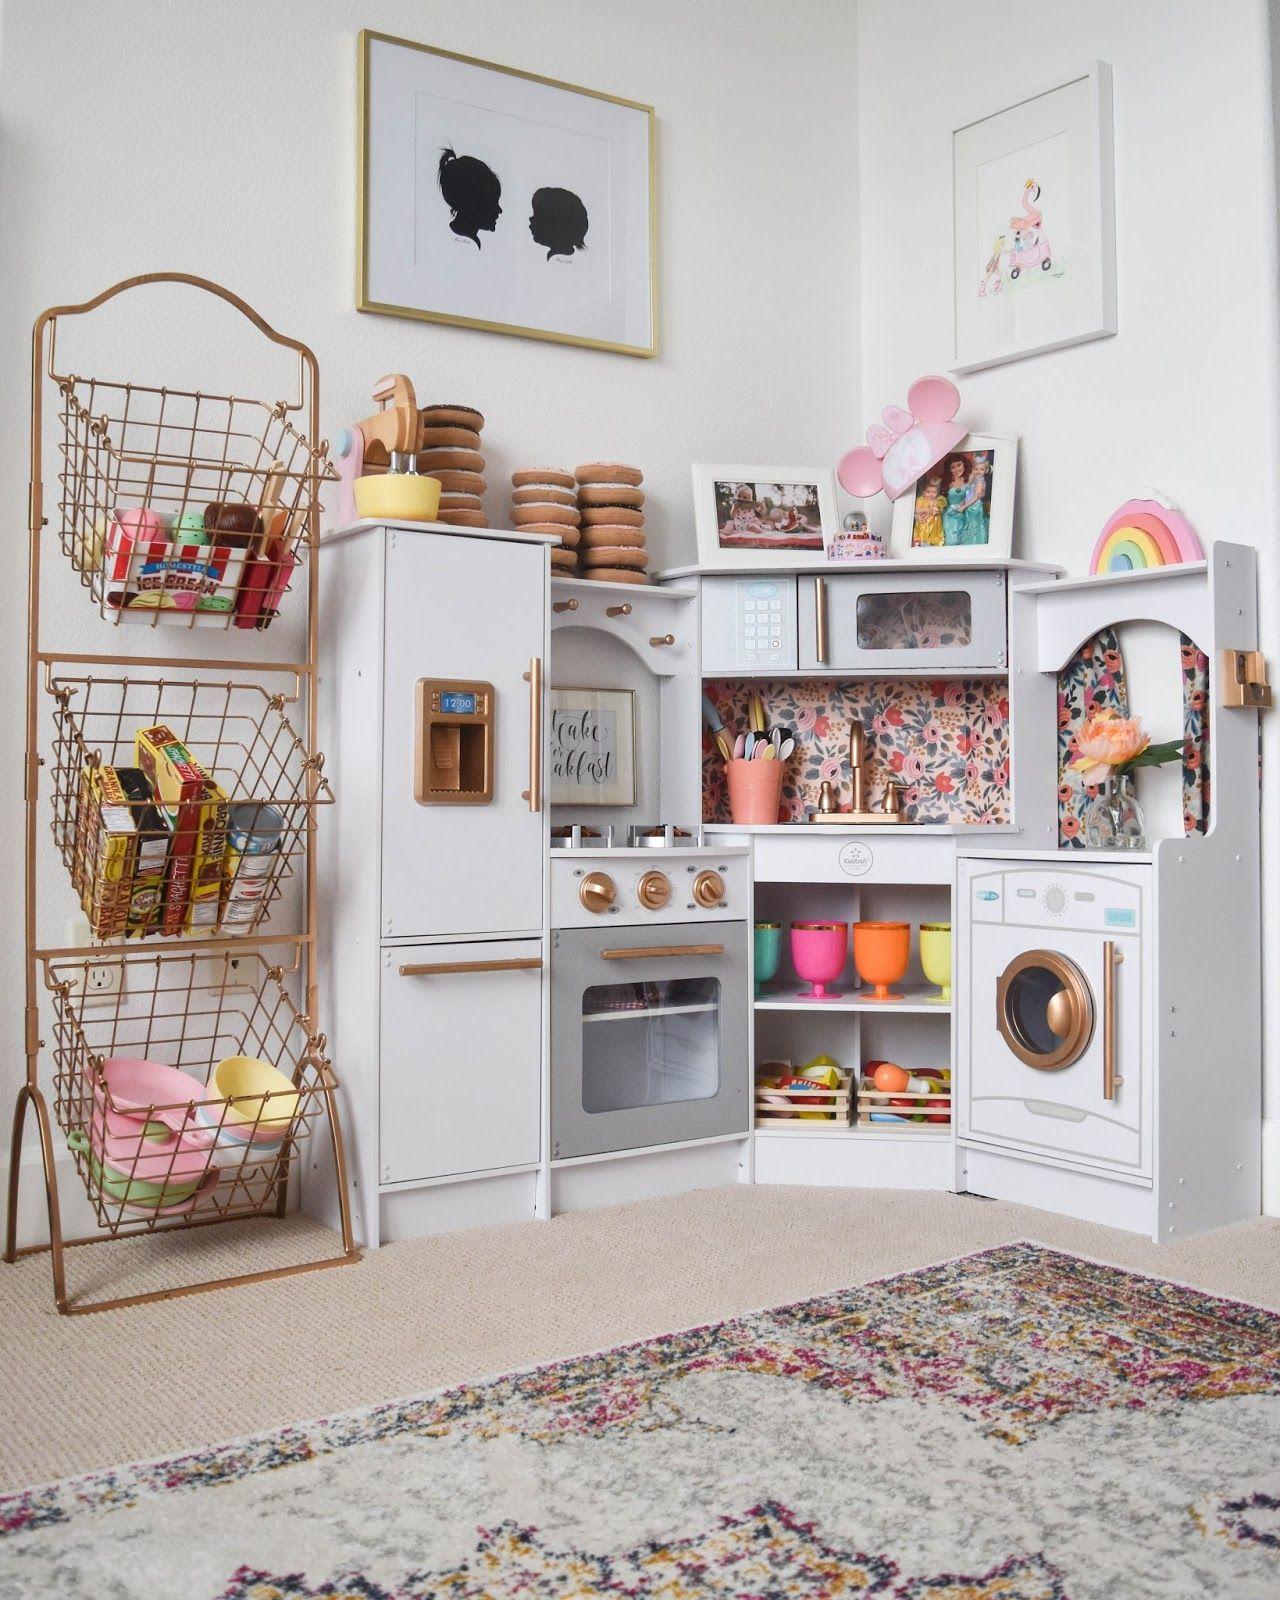 Stylish Toy Storage Ideas How to Organize Toys